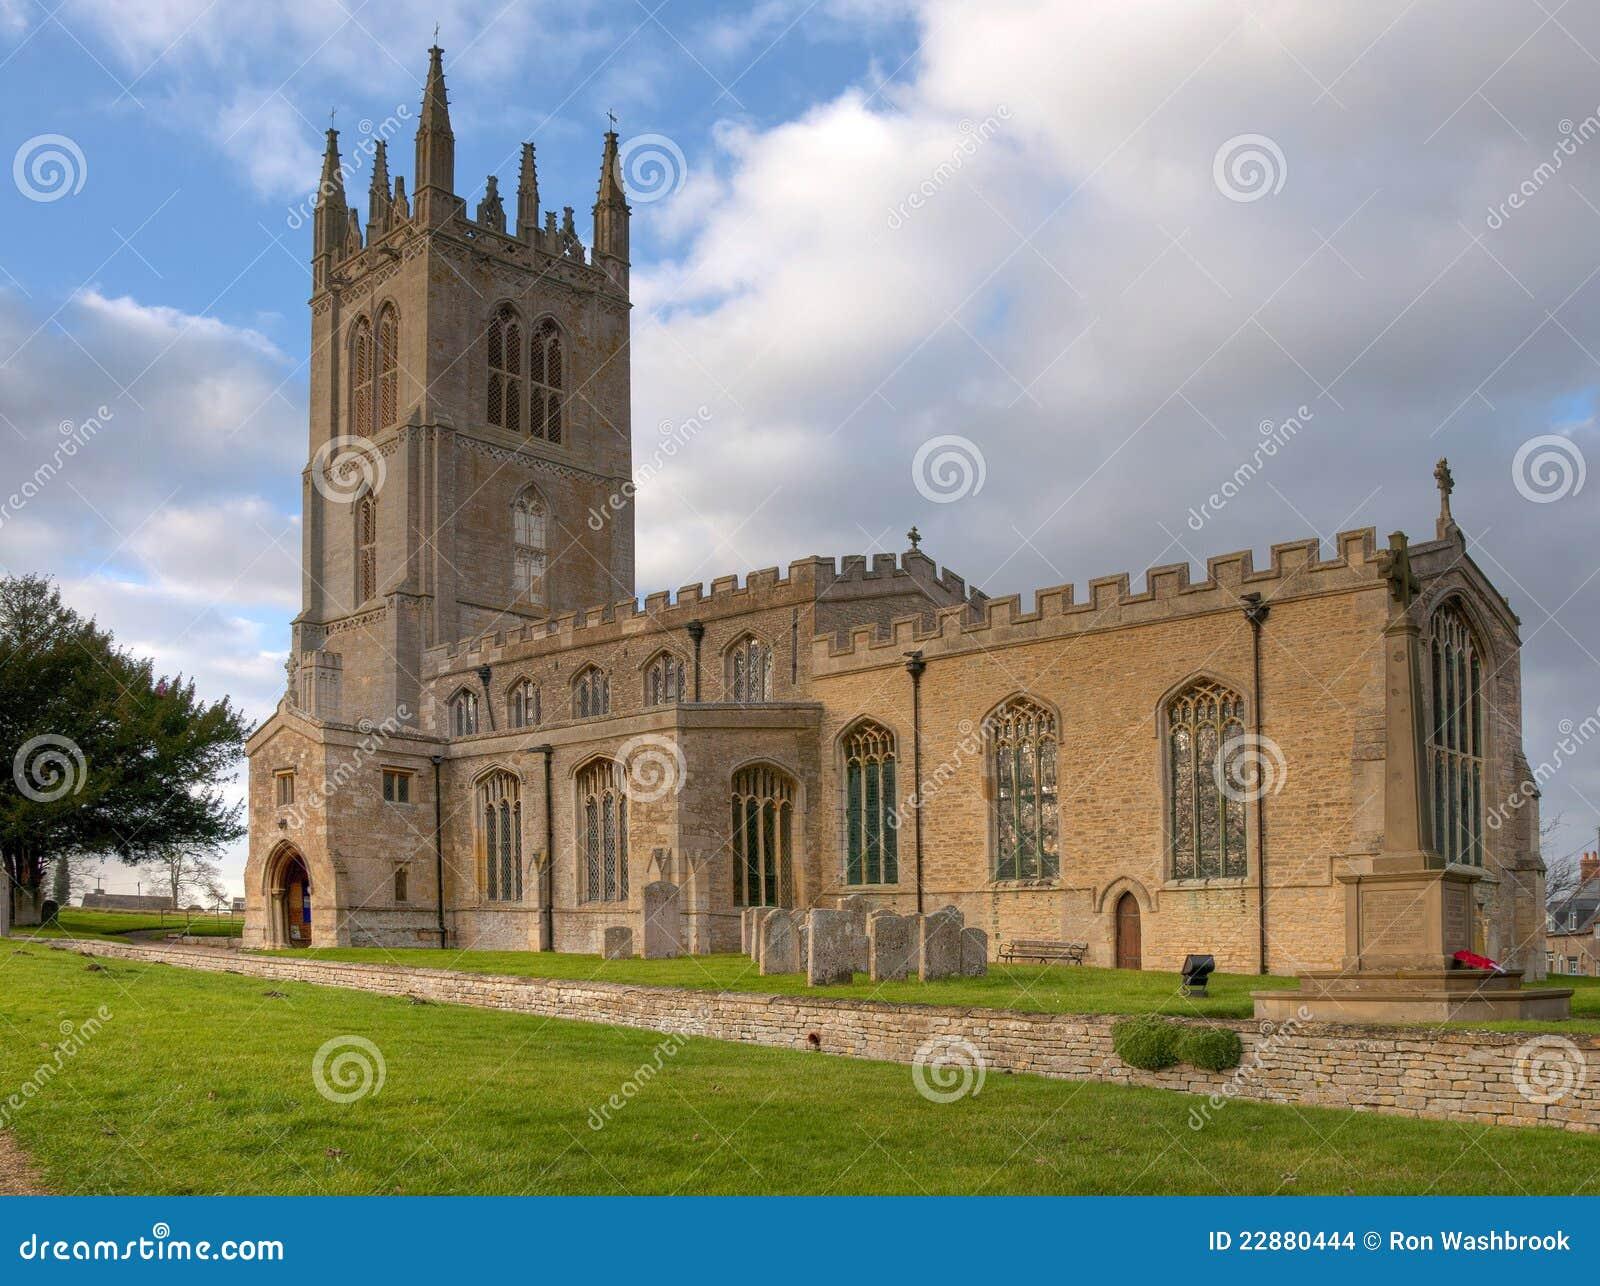 Village Church England